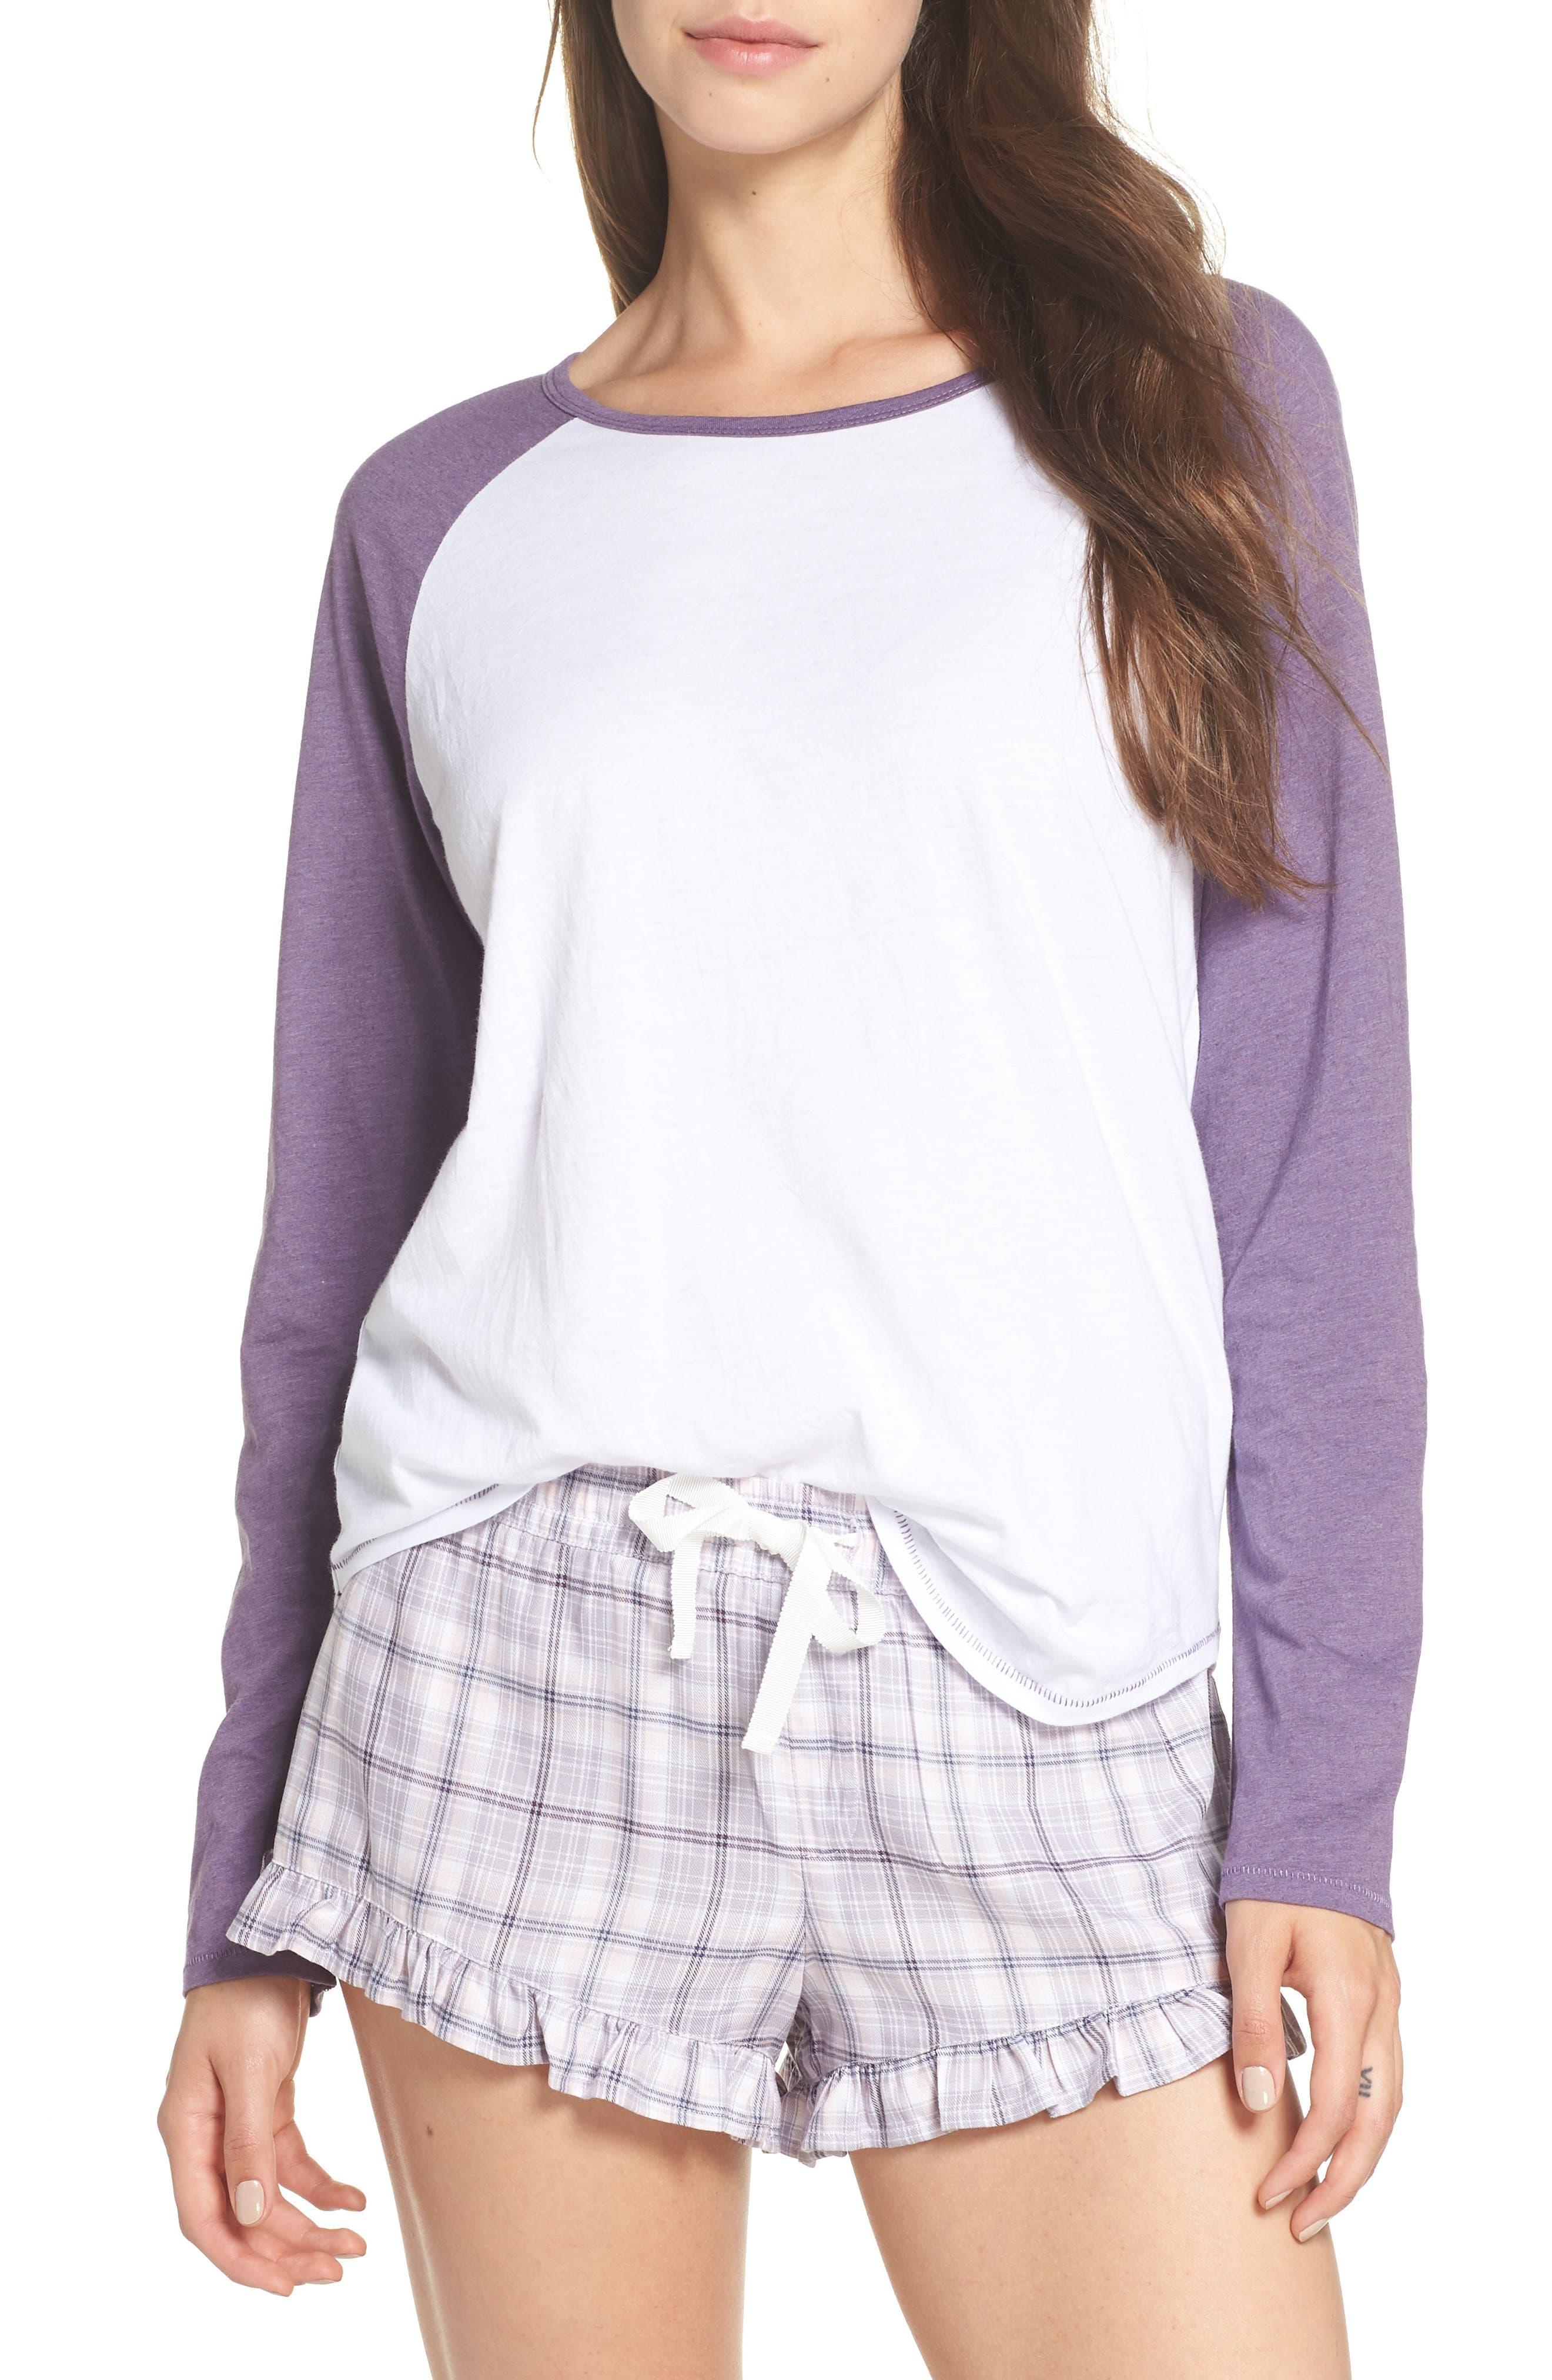 Charly Short Pajamas,                             Main thumbnail 1, color,                             LAVENDER AURA PLAID